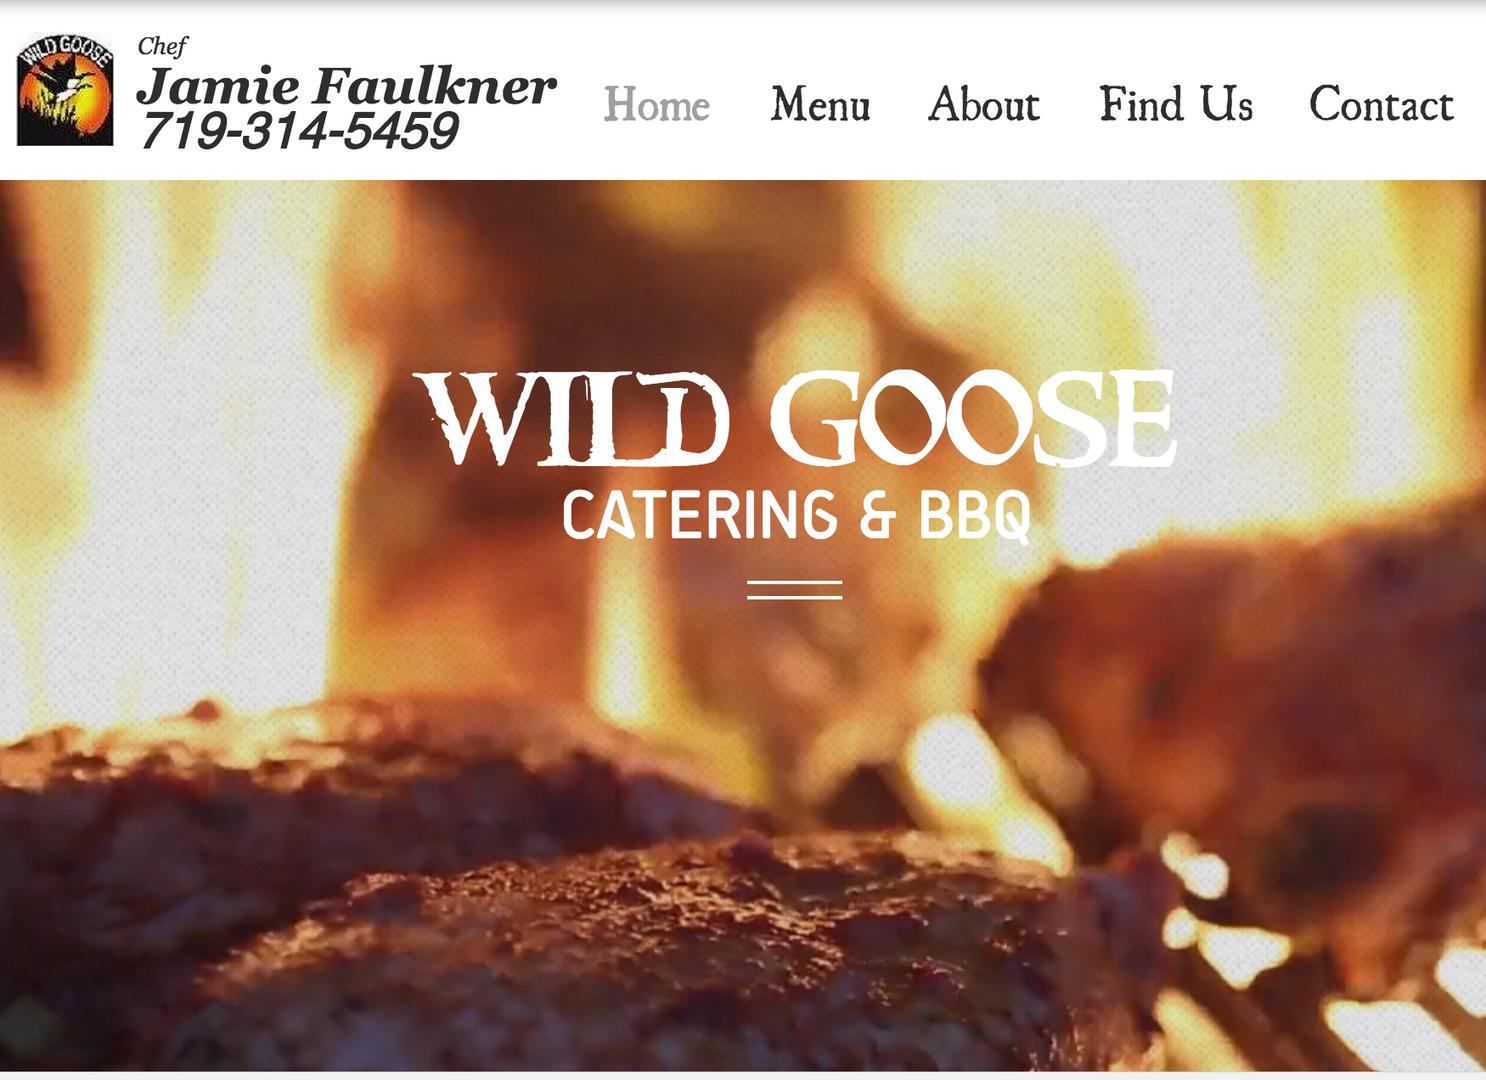 WILD GOOSE BBQ & Catering